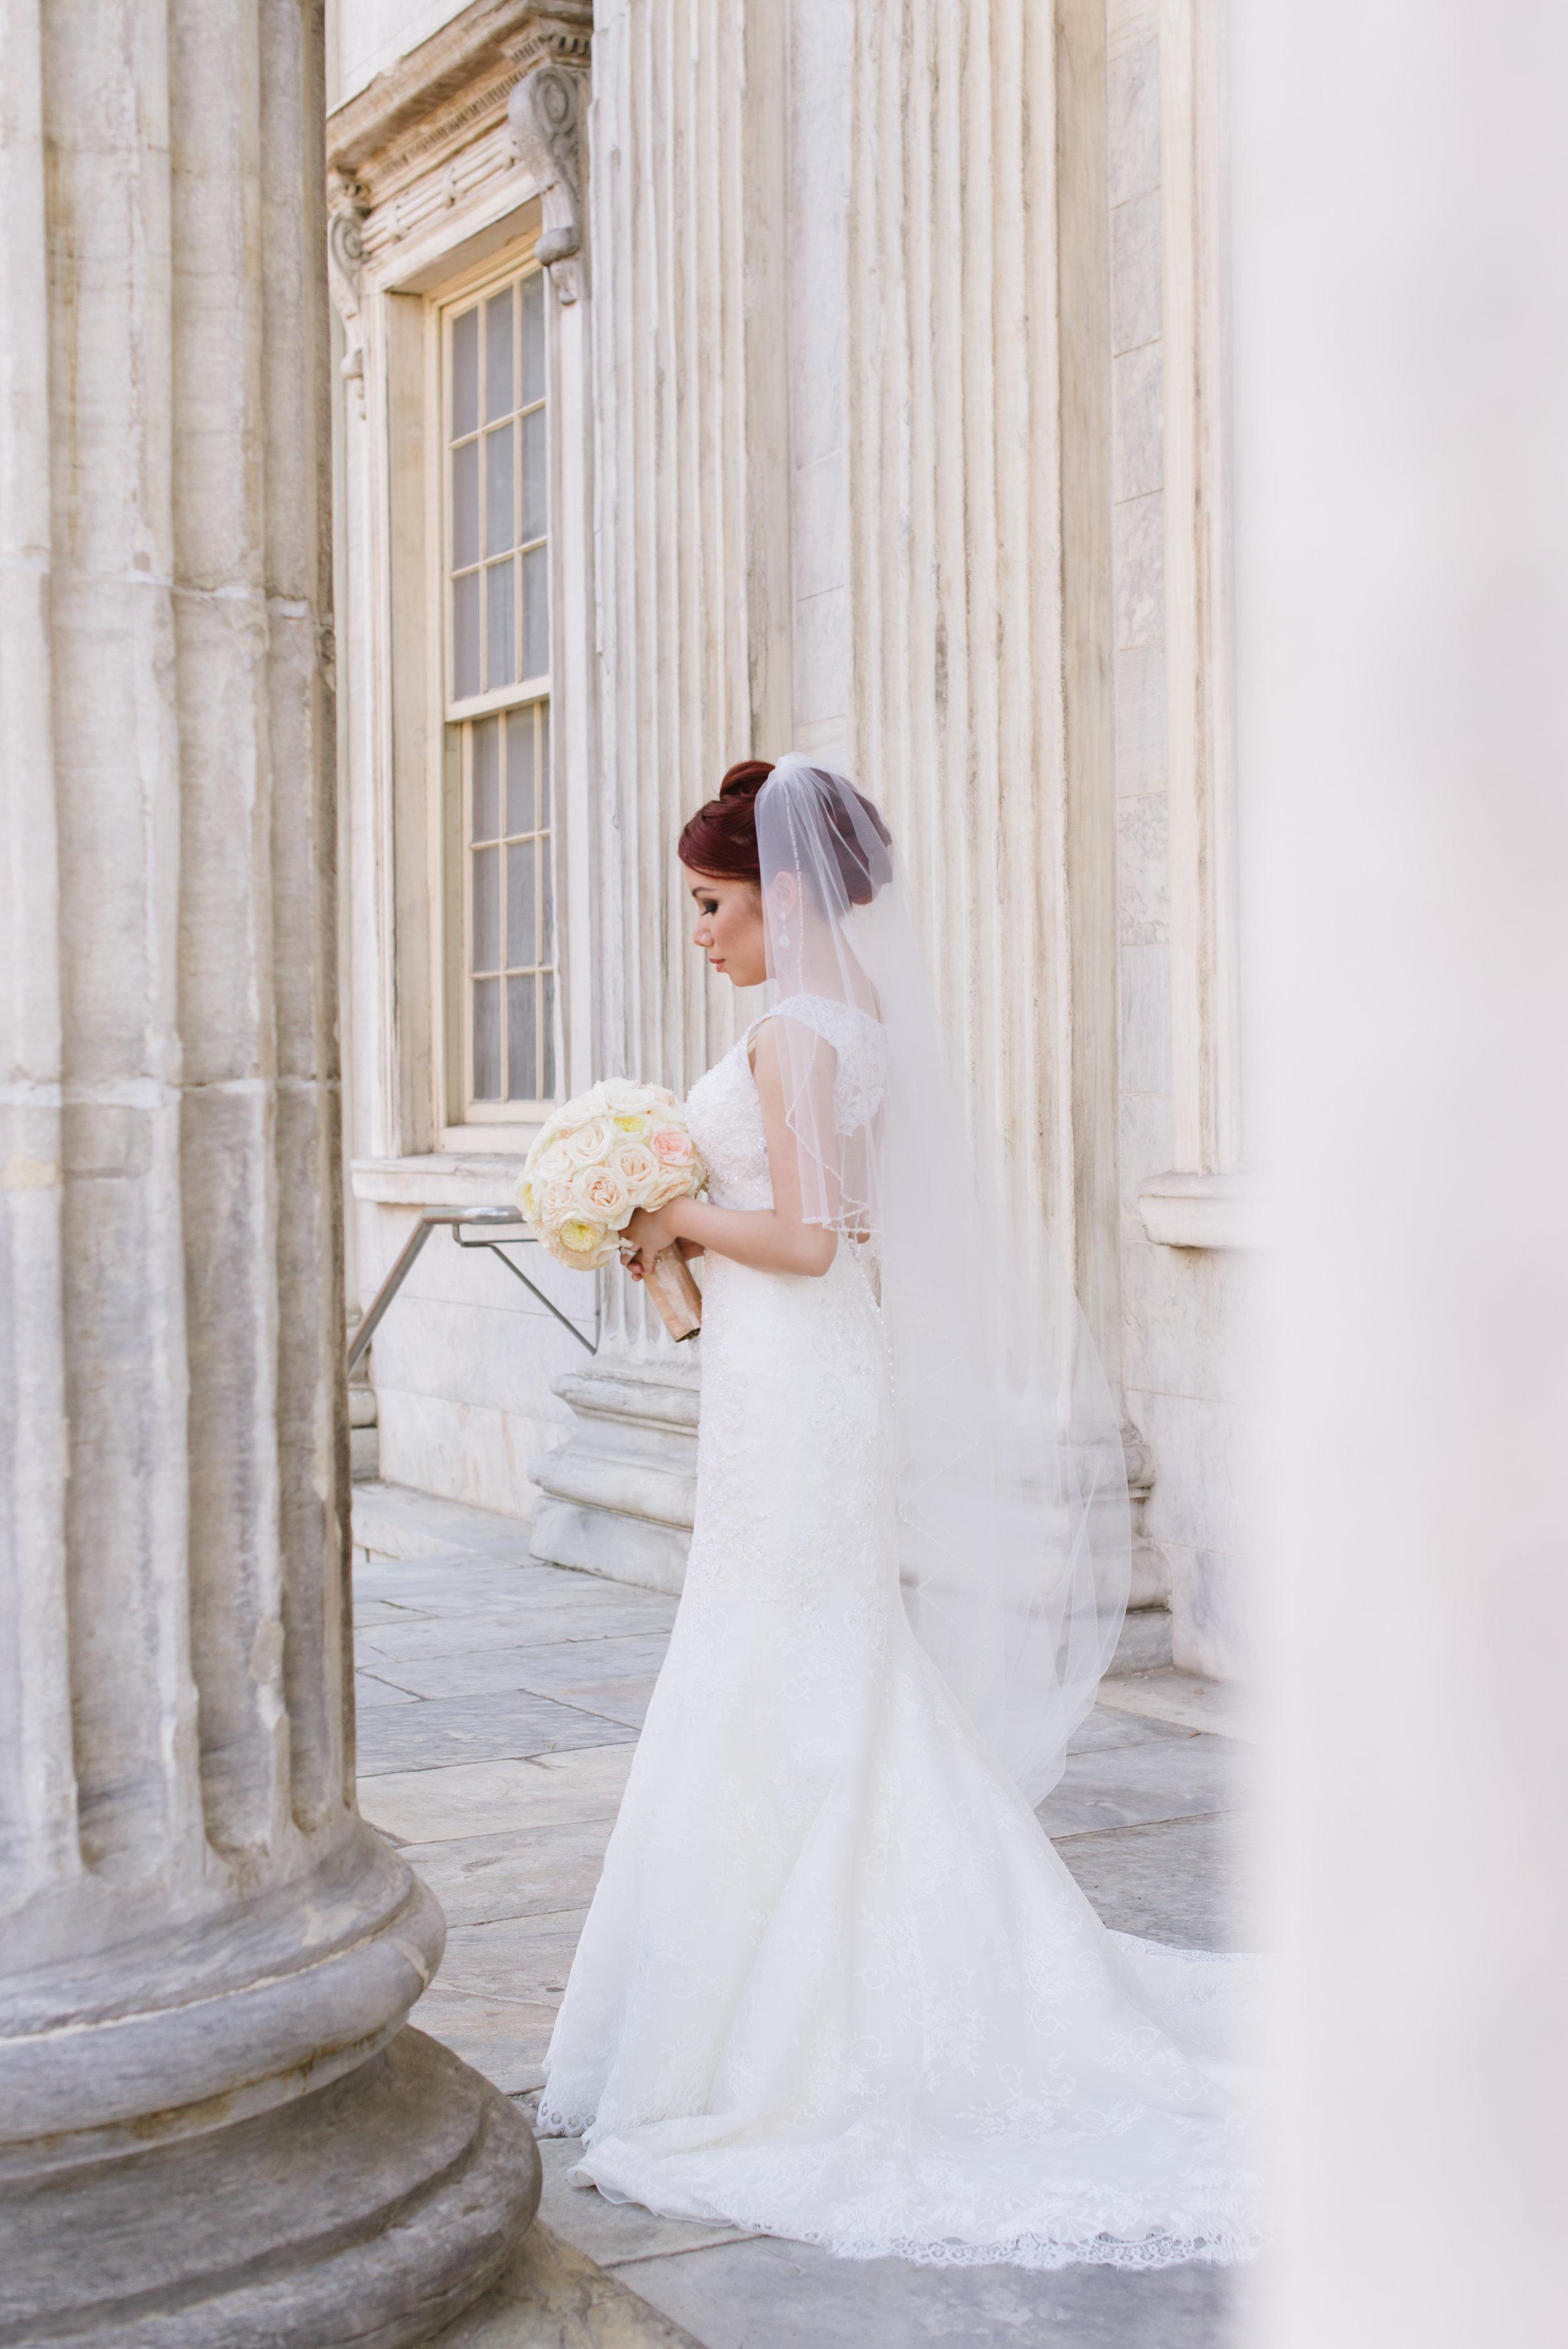 Portraits_Philadelphia-Wedding-Photographer_Jessica-Cooper-Photography-137.jpg